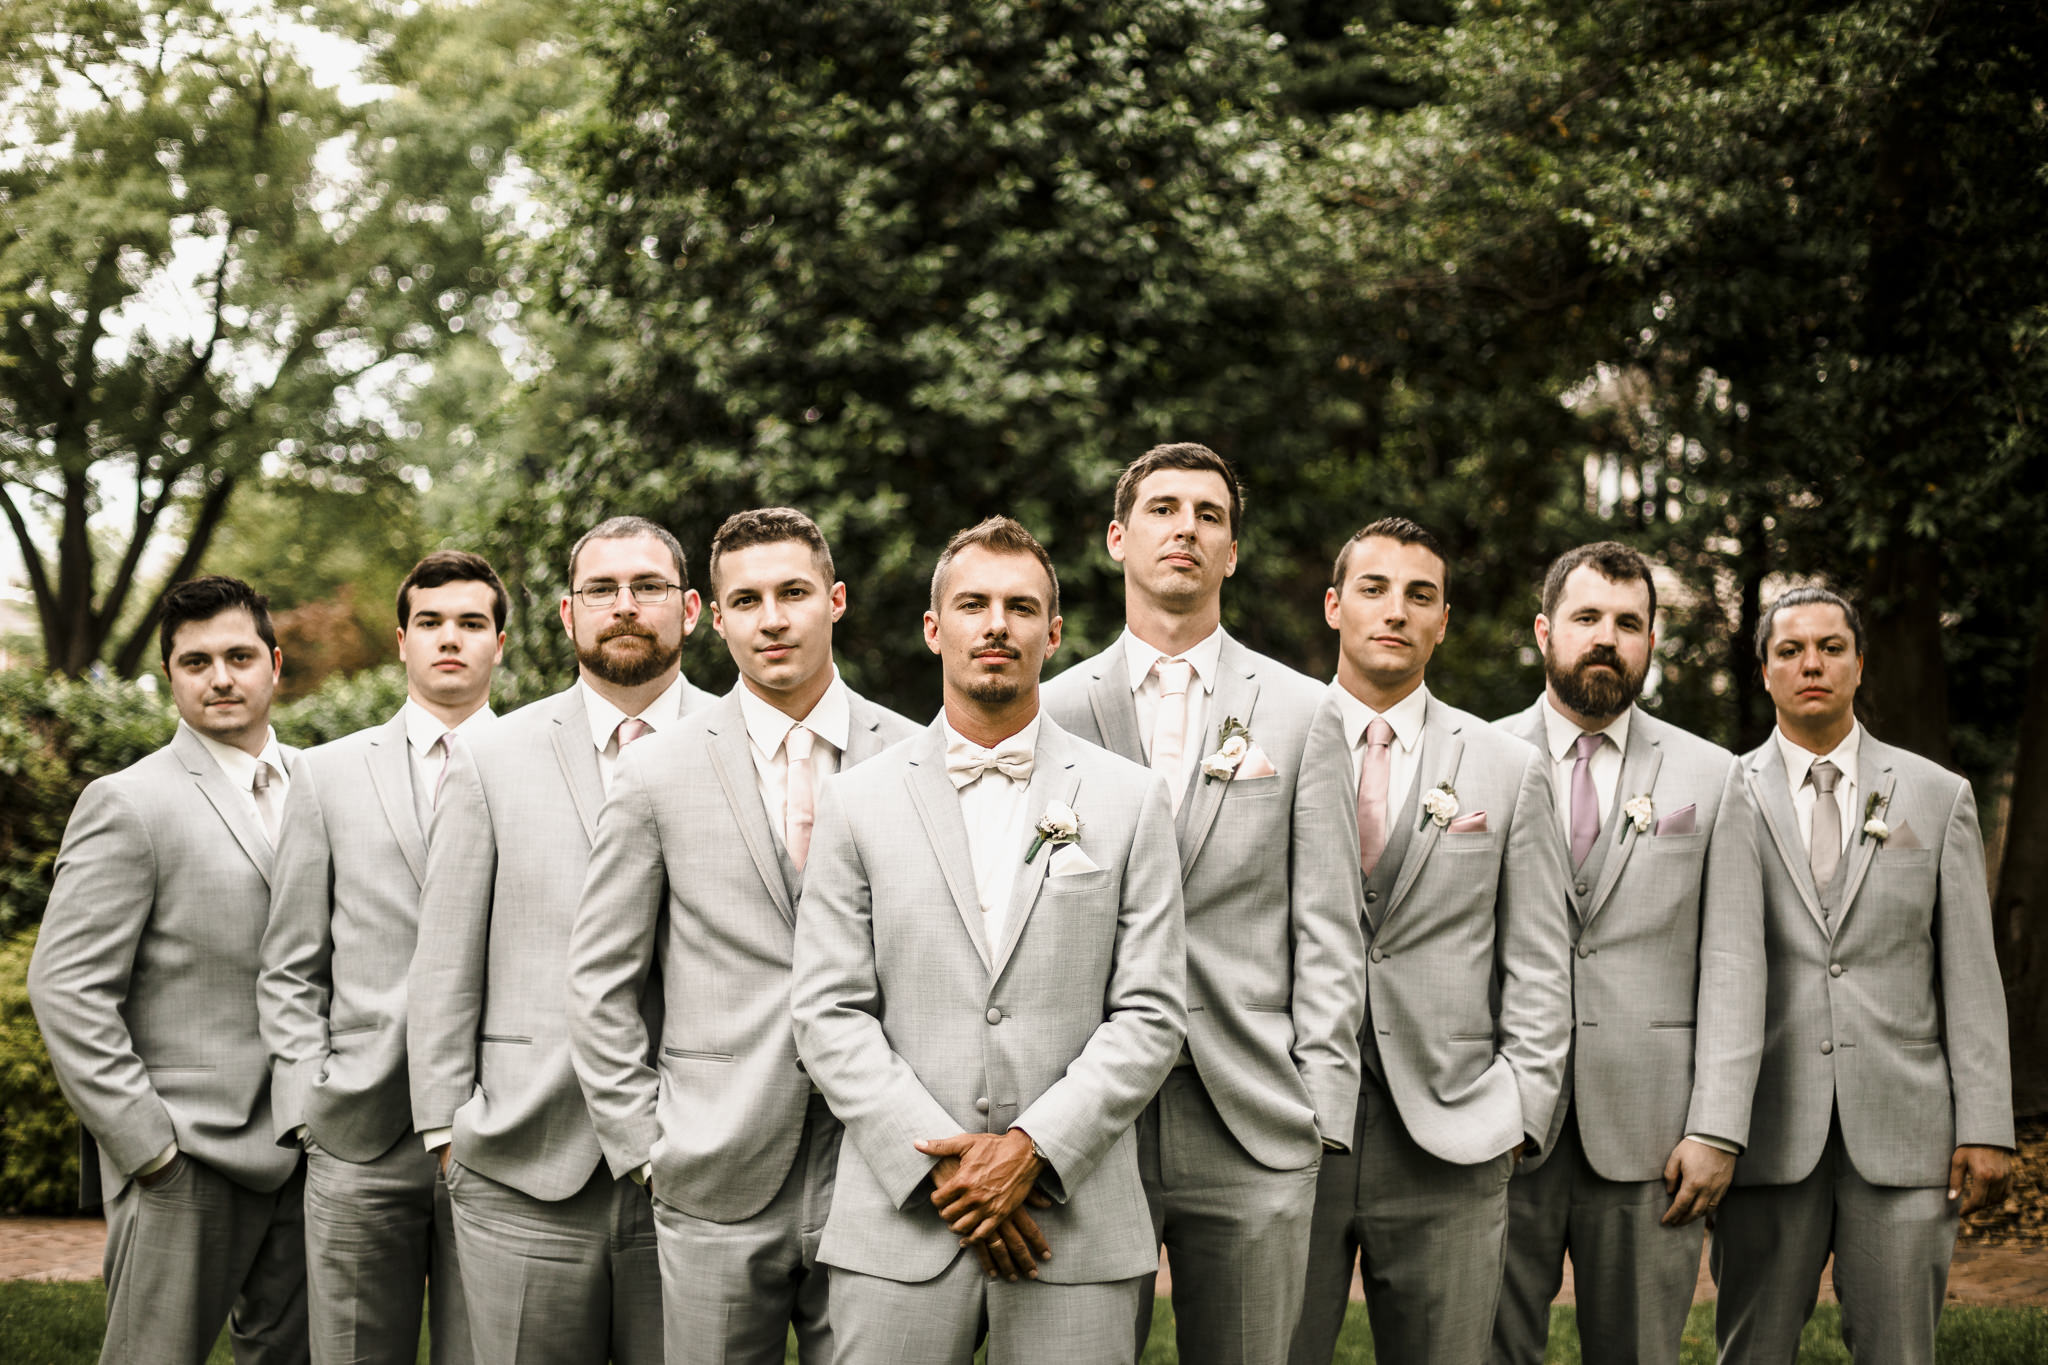 Barbato-Moorestown-Community-House-Wedding-New-Jersey-Photographer-15.JPG